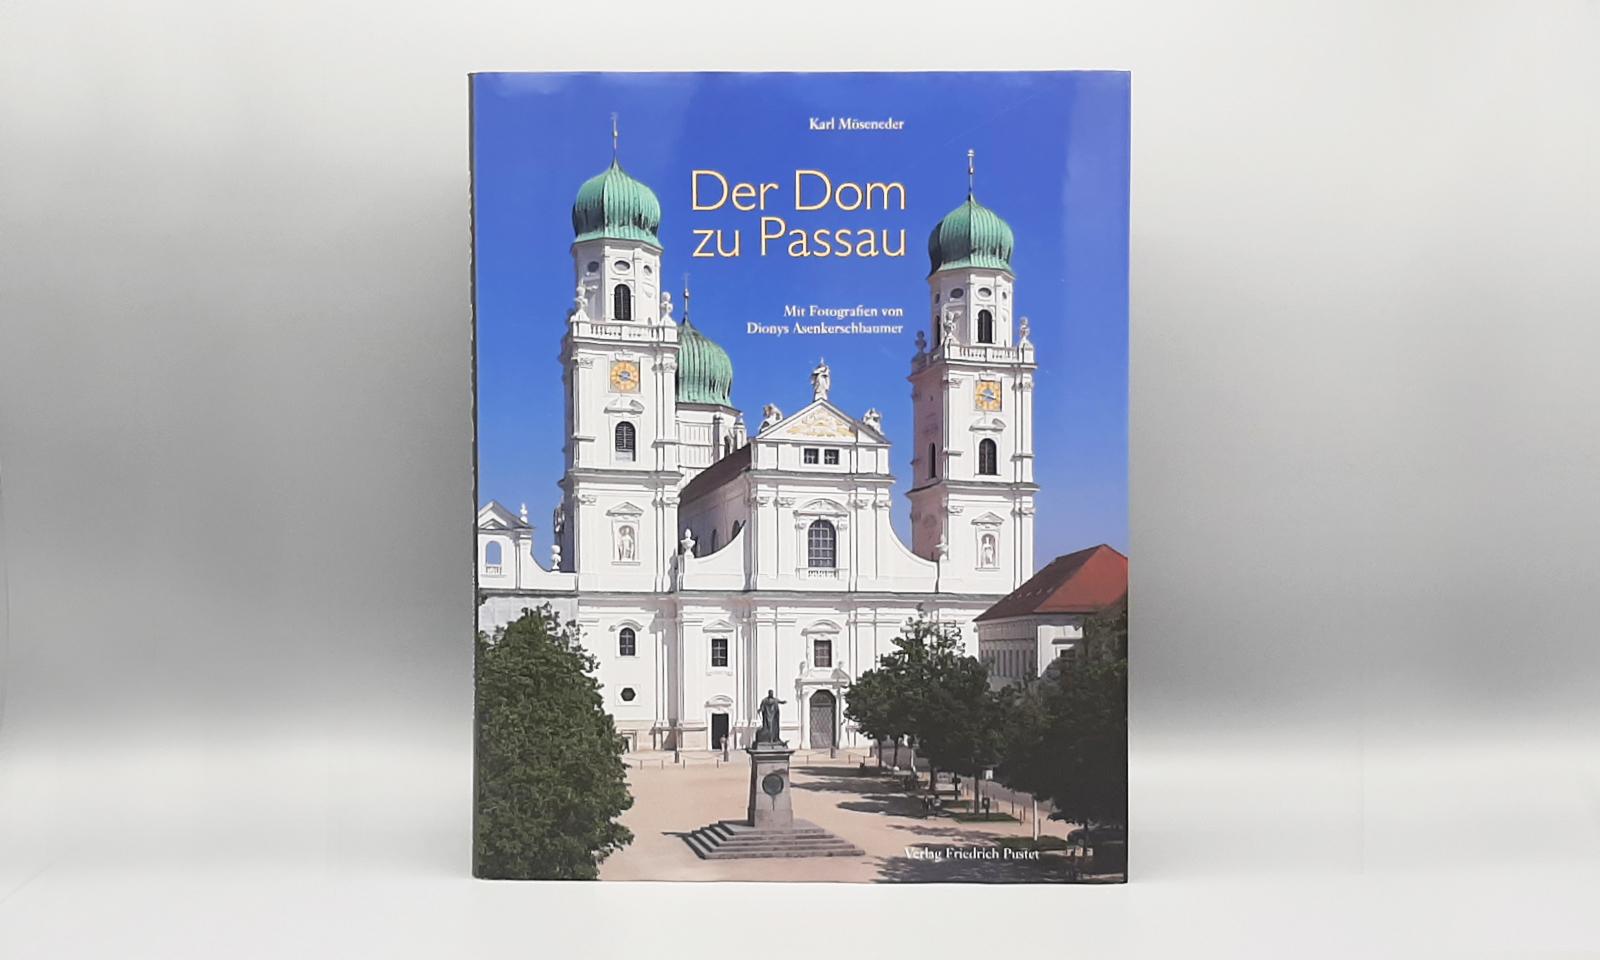 Dom zu Passau2